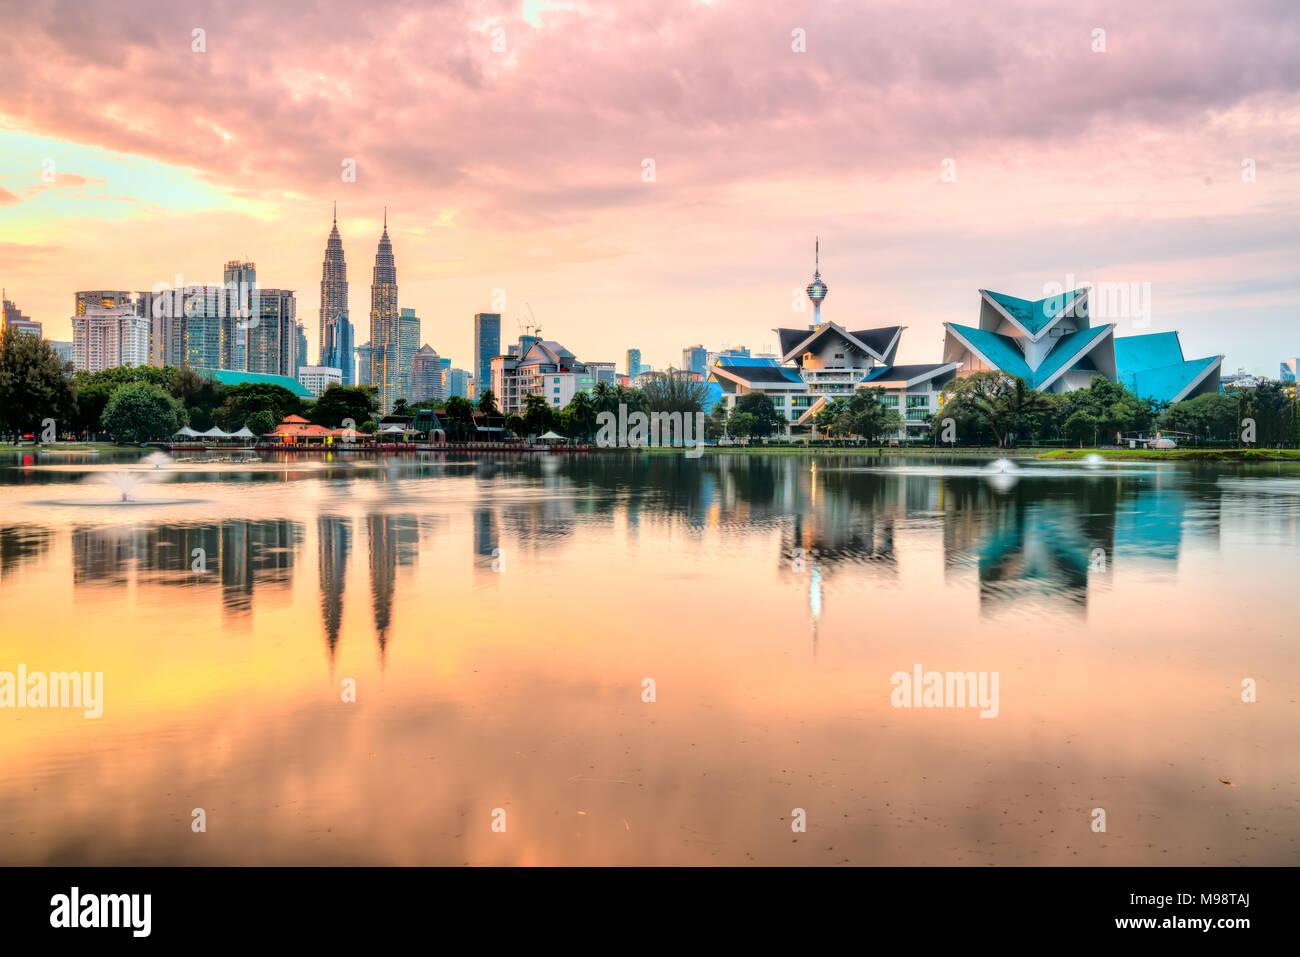 Kuala Lumpur, Malasia. Silueta de Titiwangsa Sunset Park. Imagen De Stock